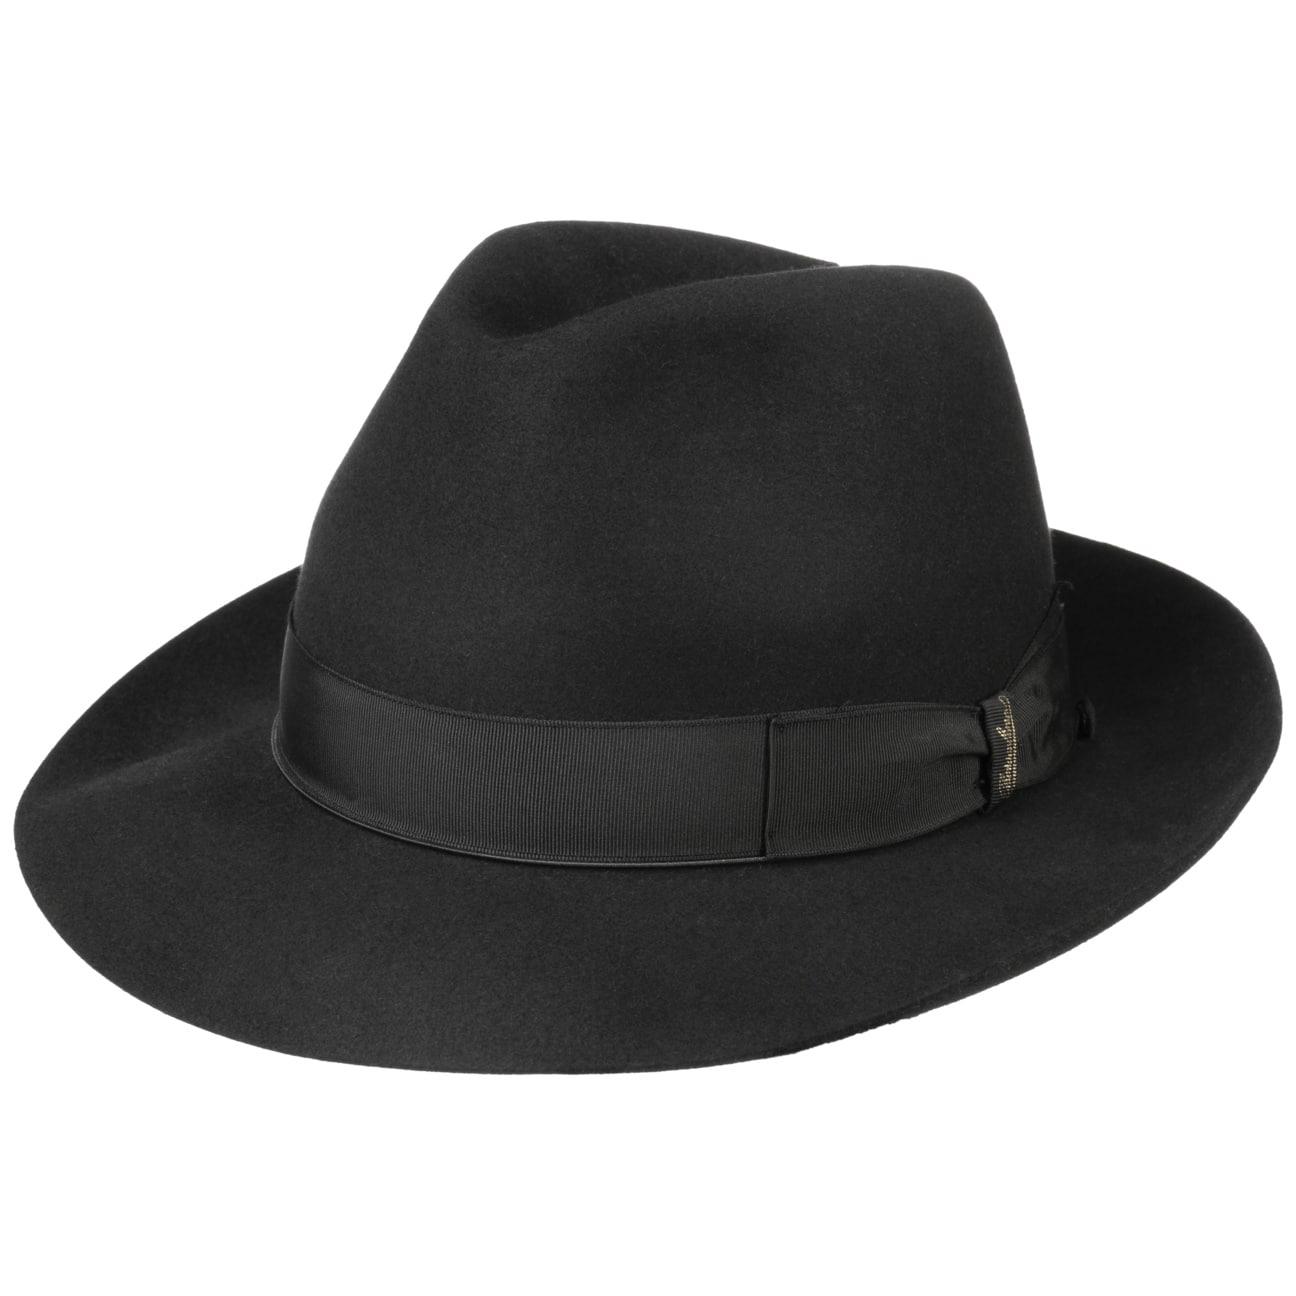 borsalino hat classic gbp 363 95 hats caps beanies